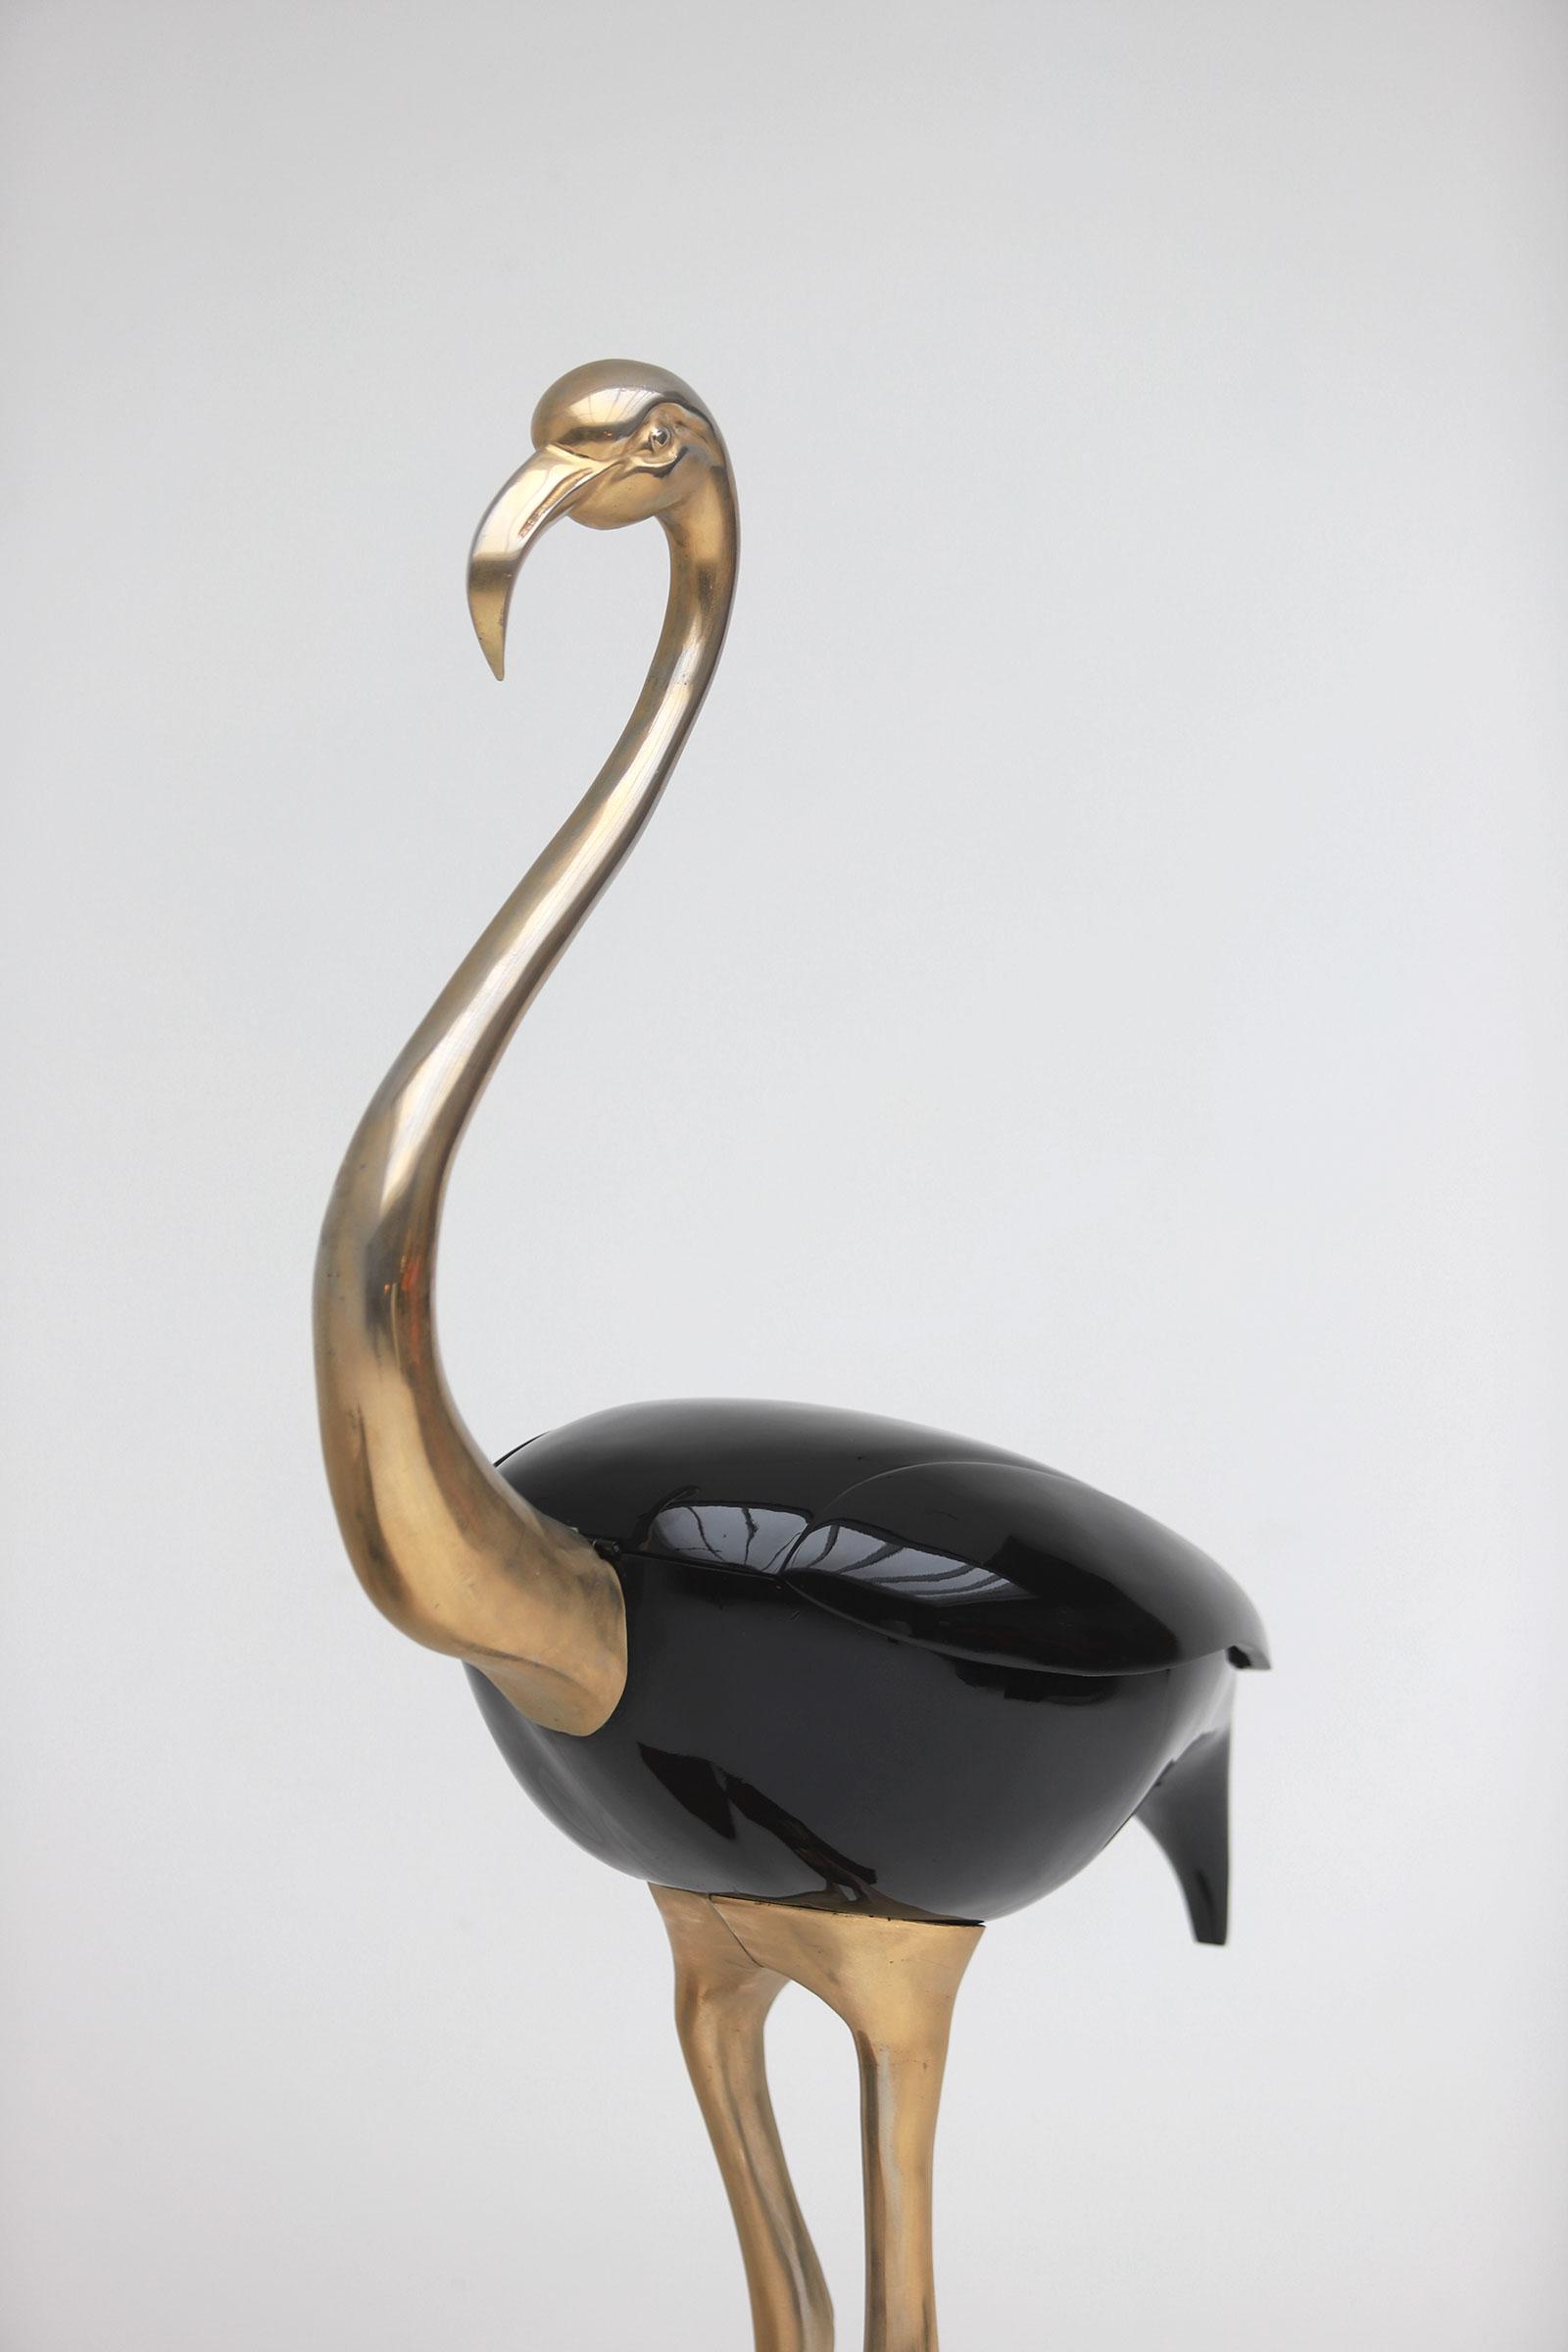 Fondica Lifesize Brass Flamingo 1970simage 12